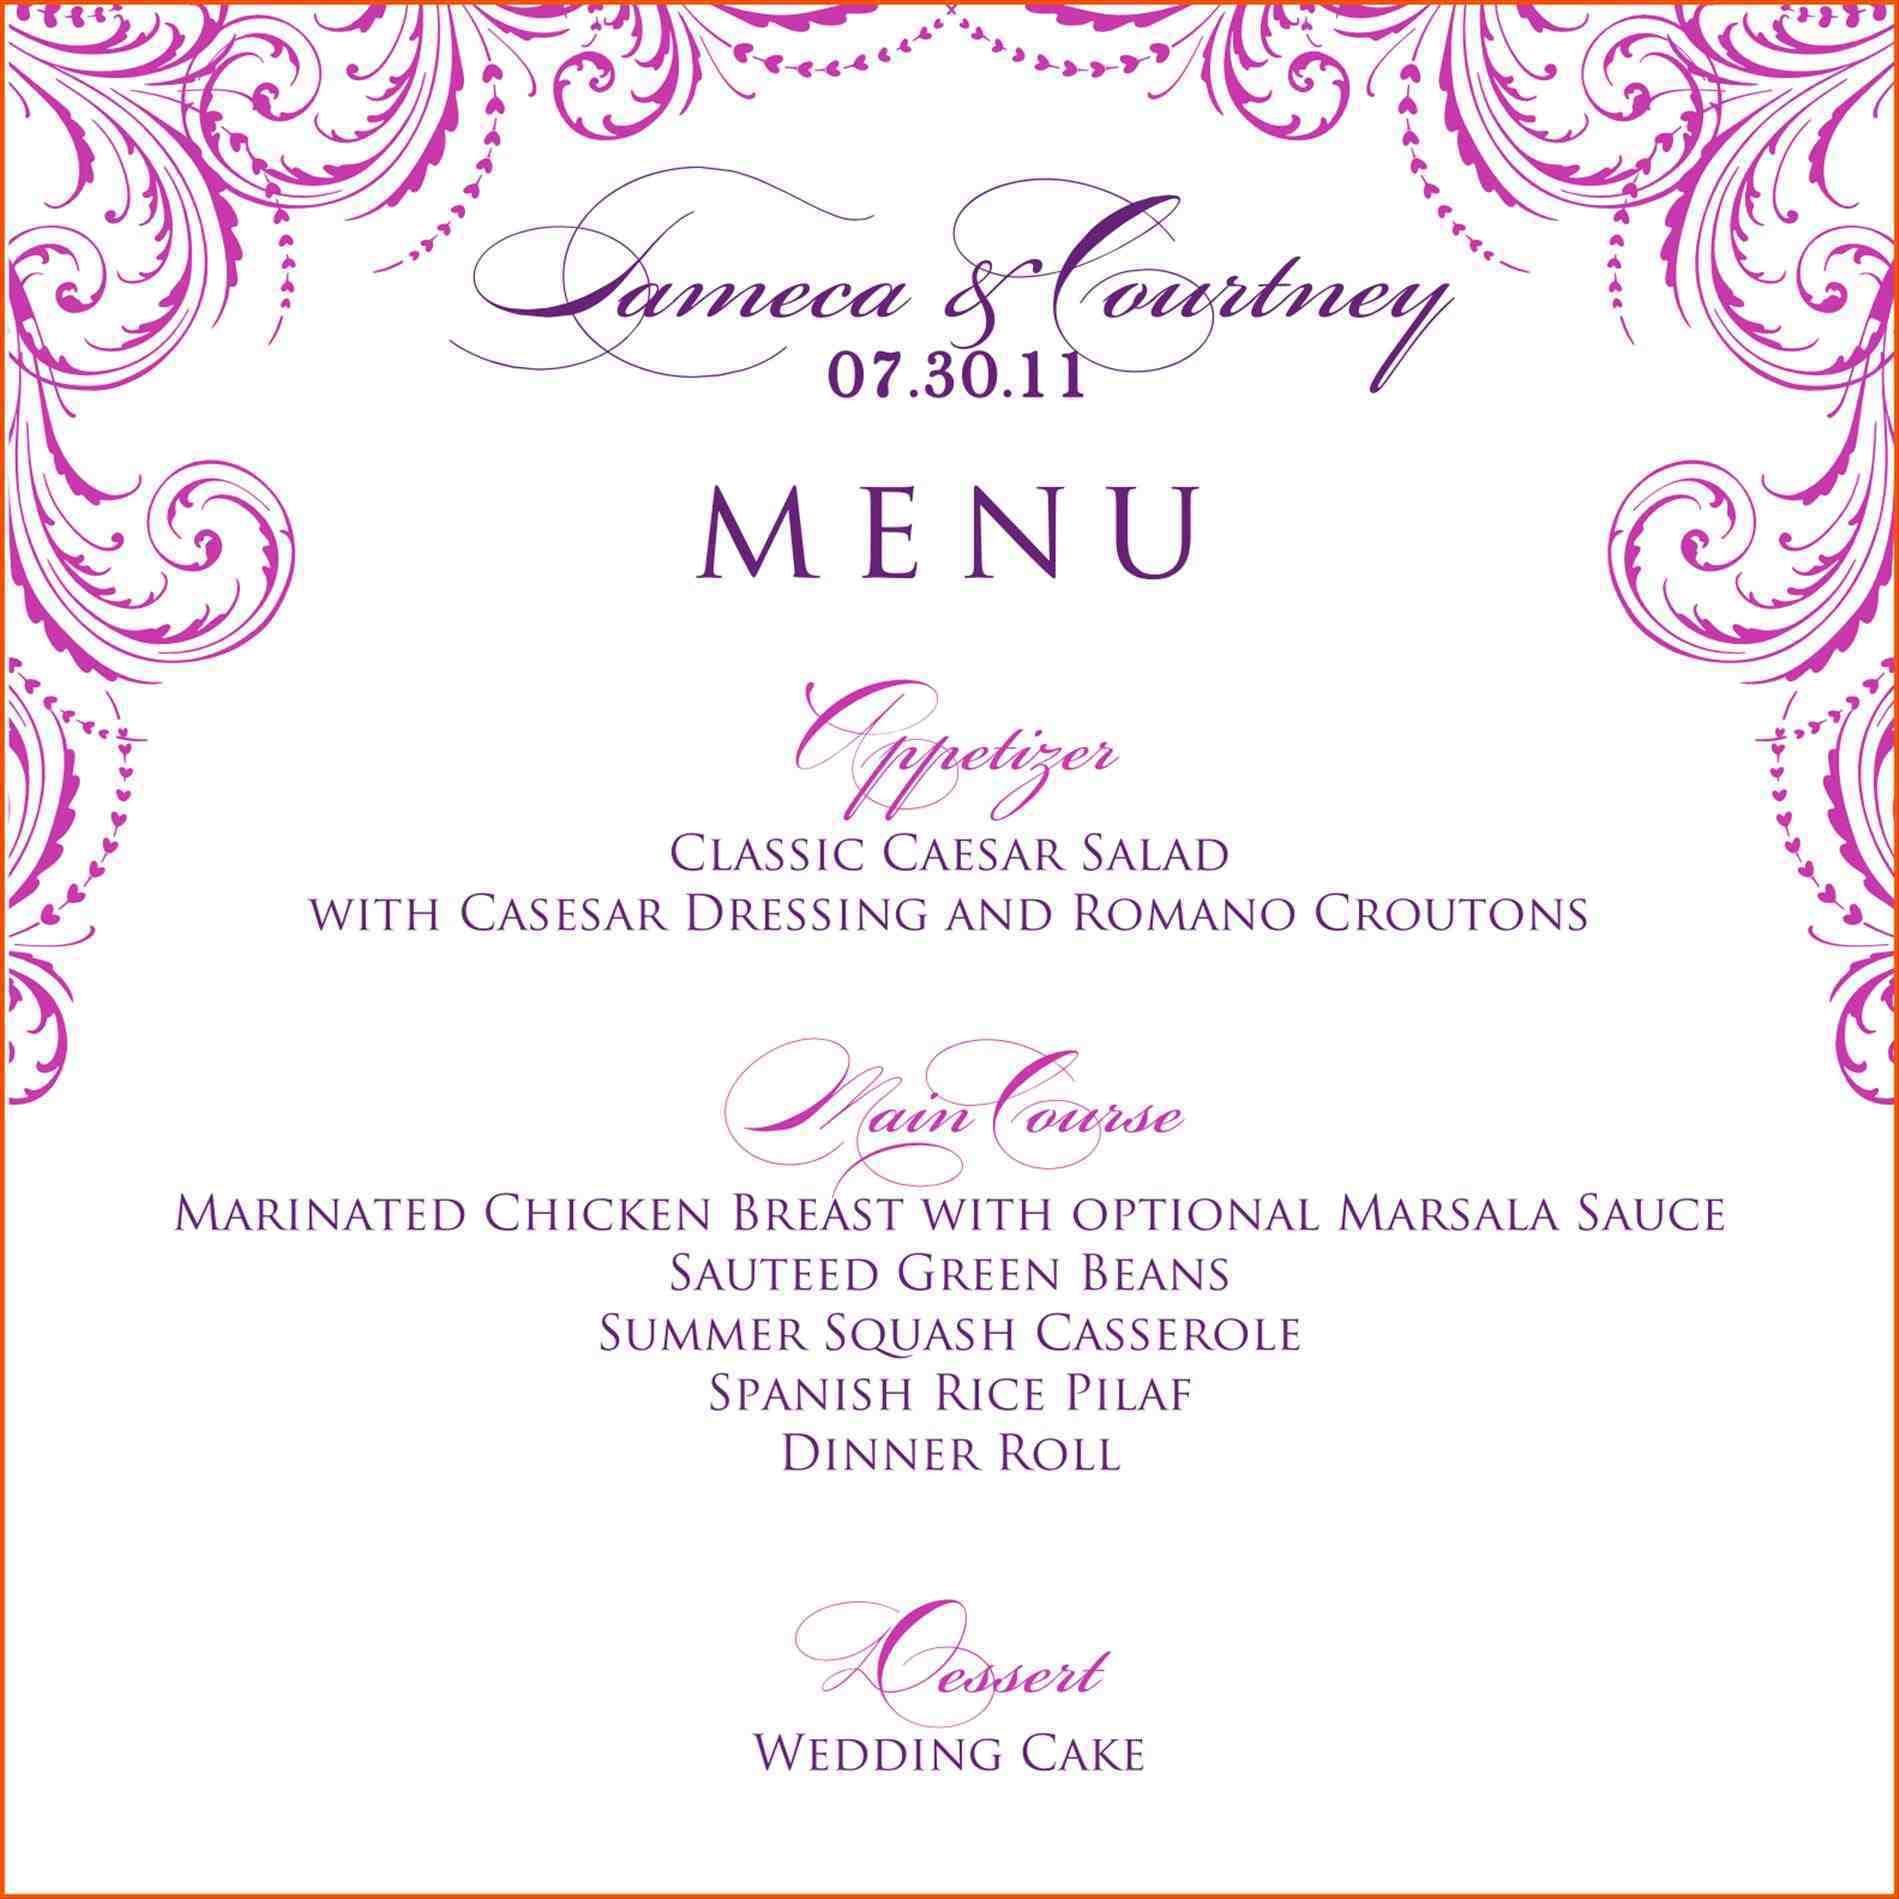 Hgtv Menu Design Templates Free Insssrenterprisesco Menu Catering - Catering menu design templates